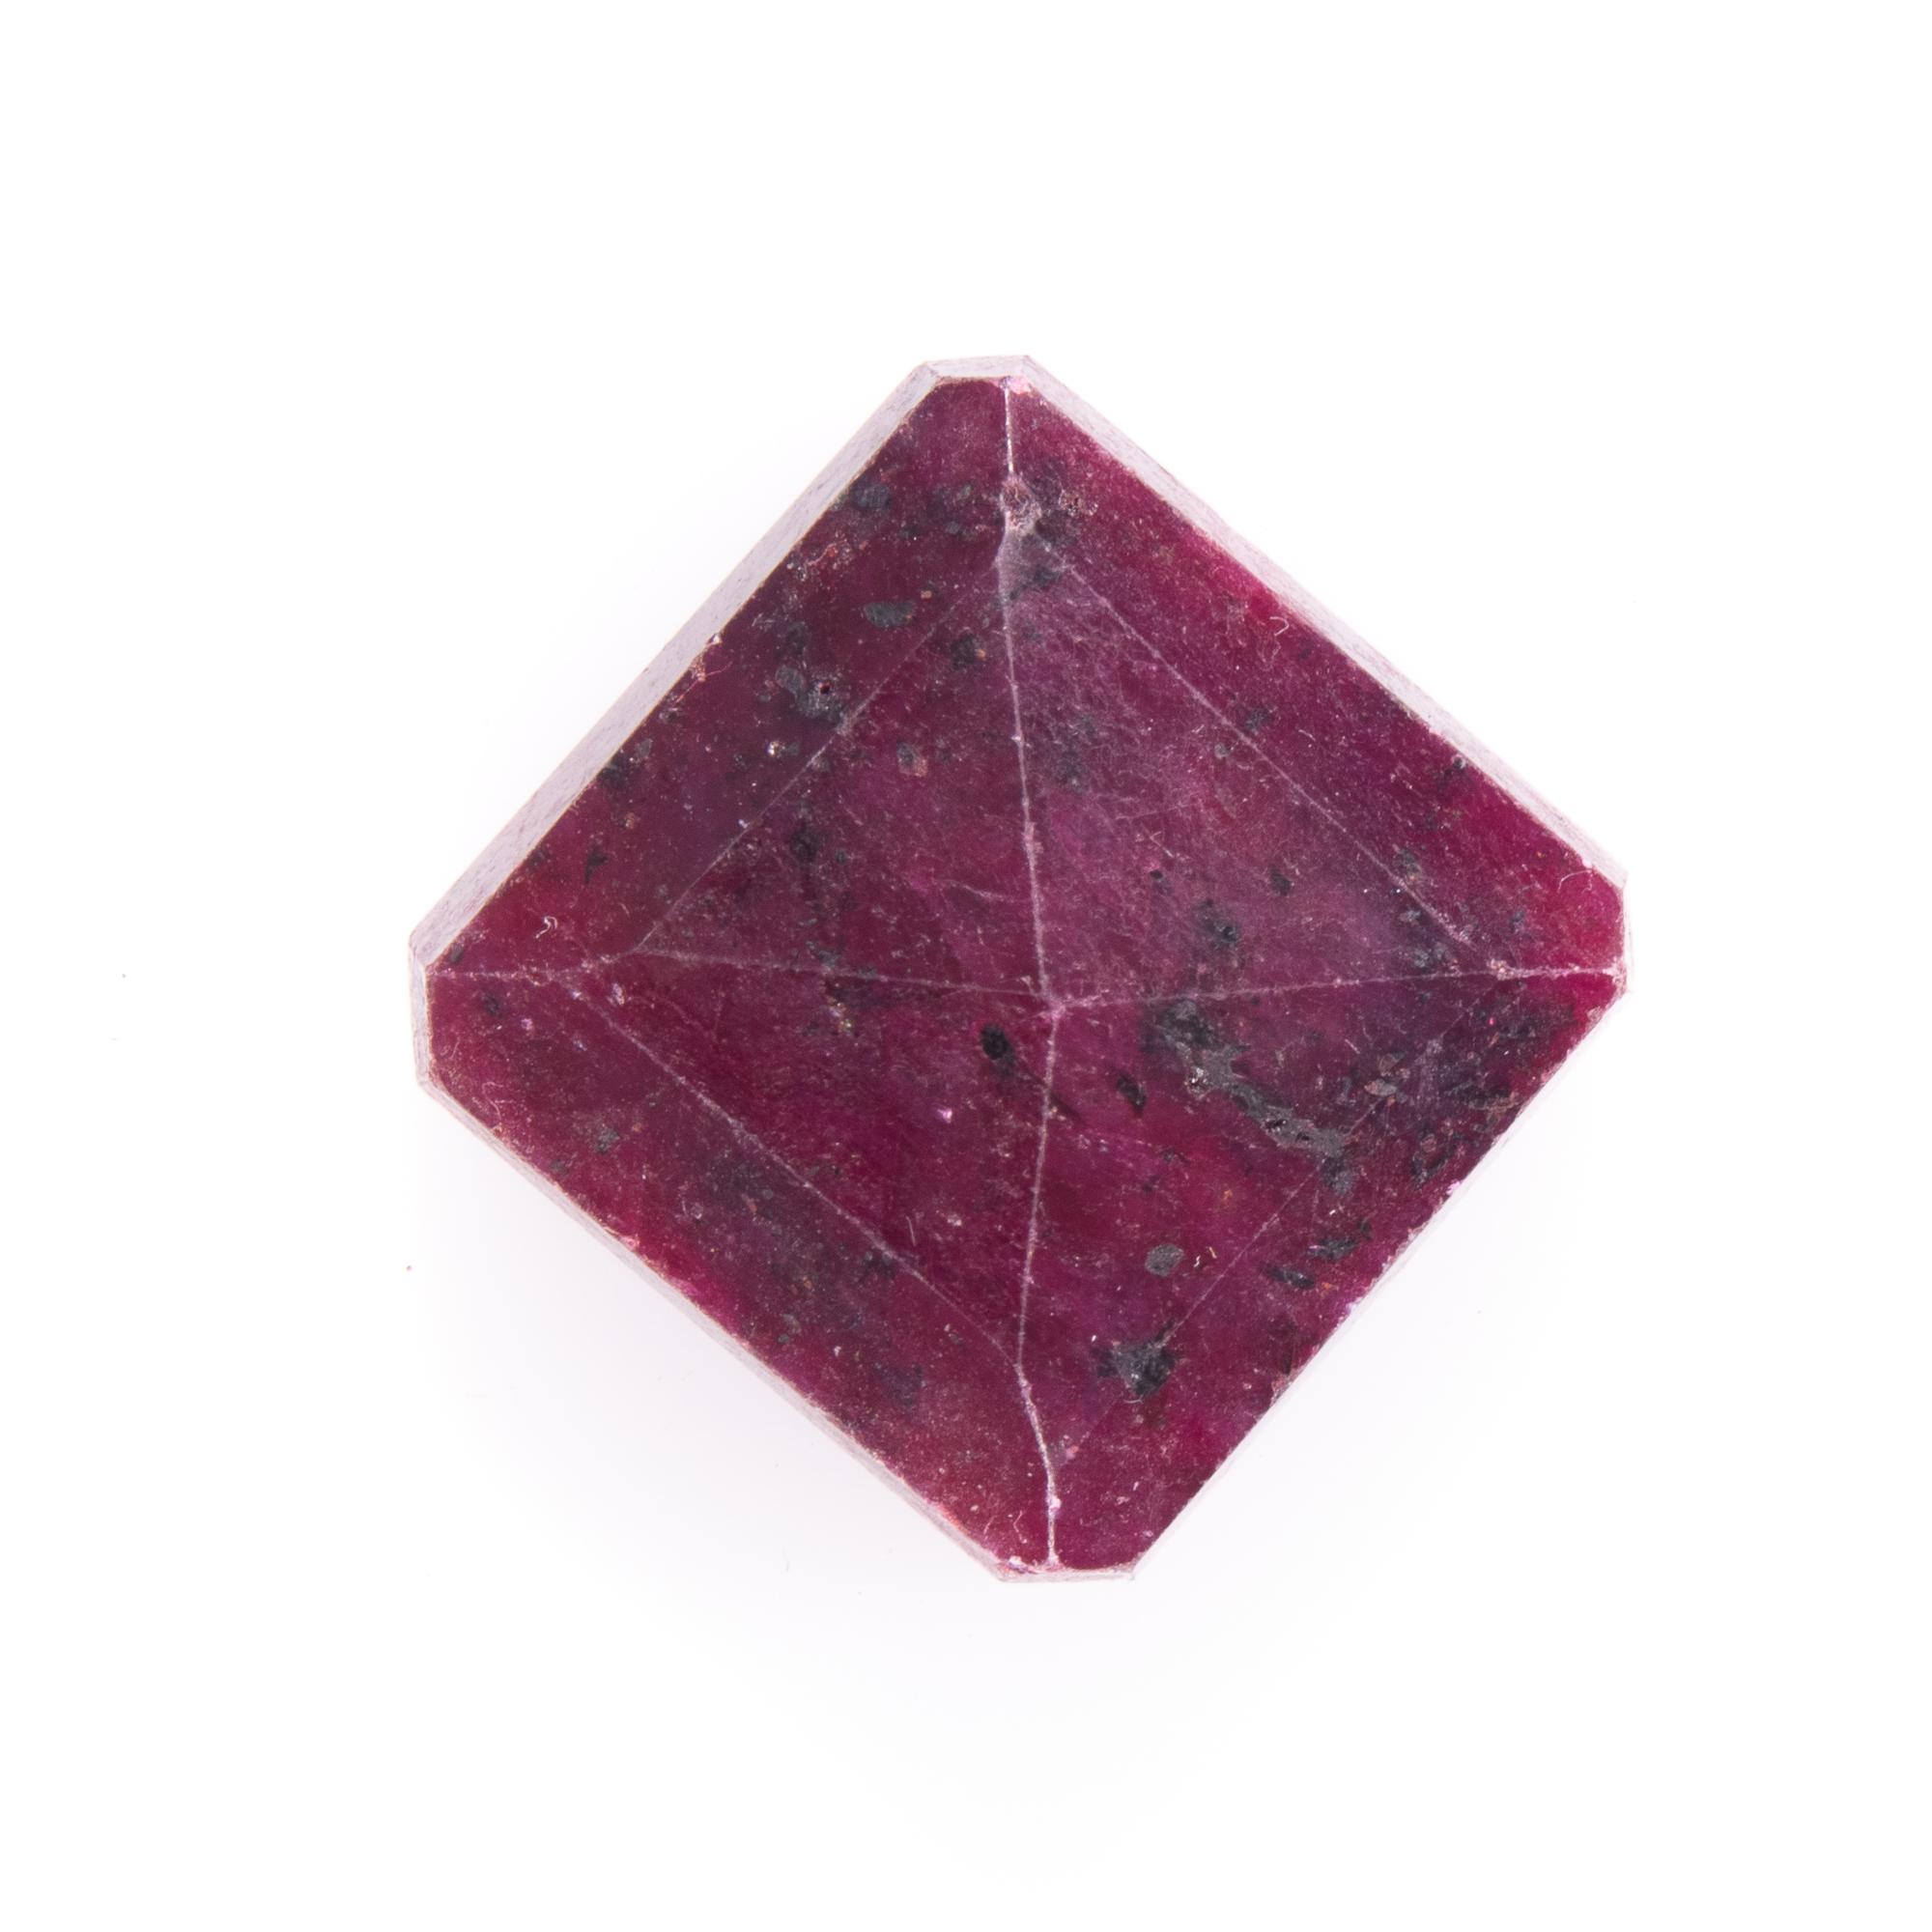 127ct Ruby Gemstone - Image 4 of 7